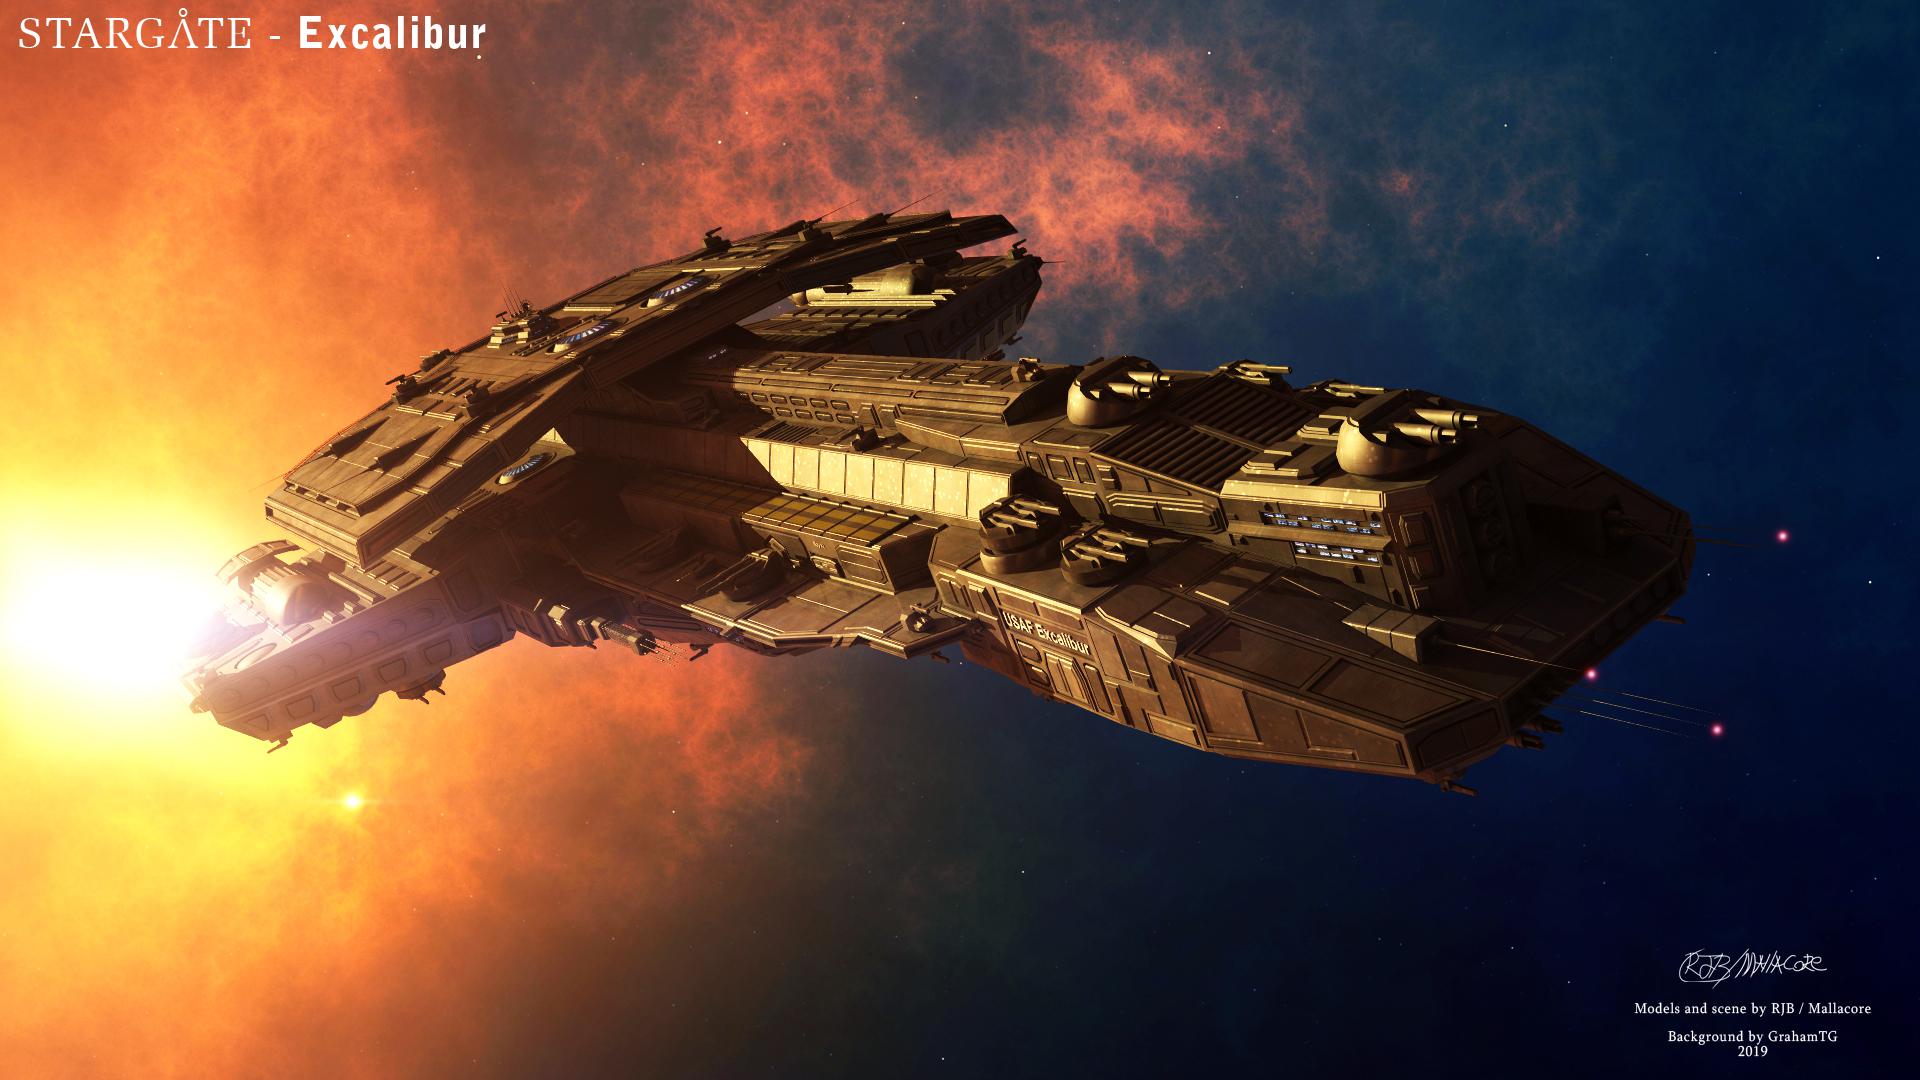 Stargate - Excalibur by Mallacore : Stargate